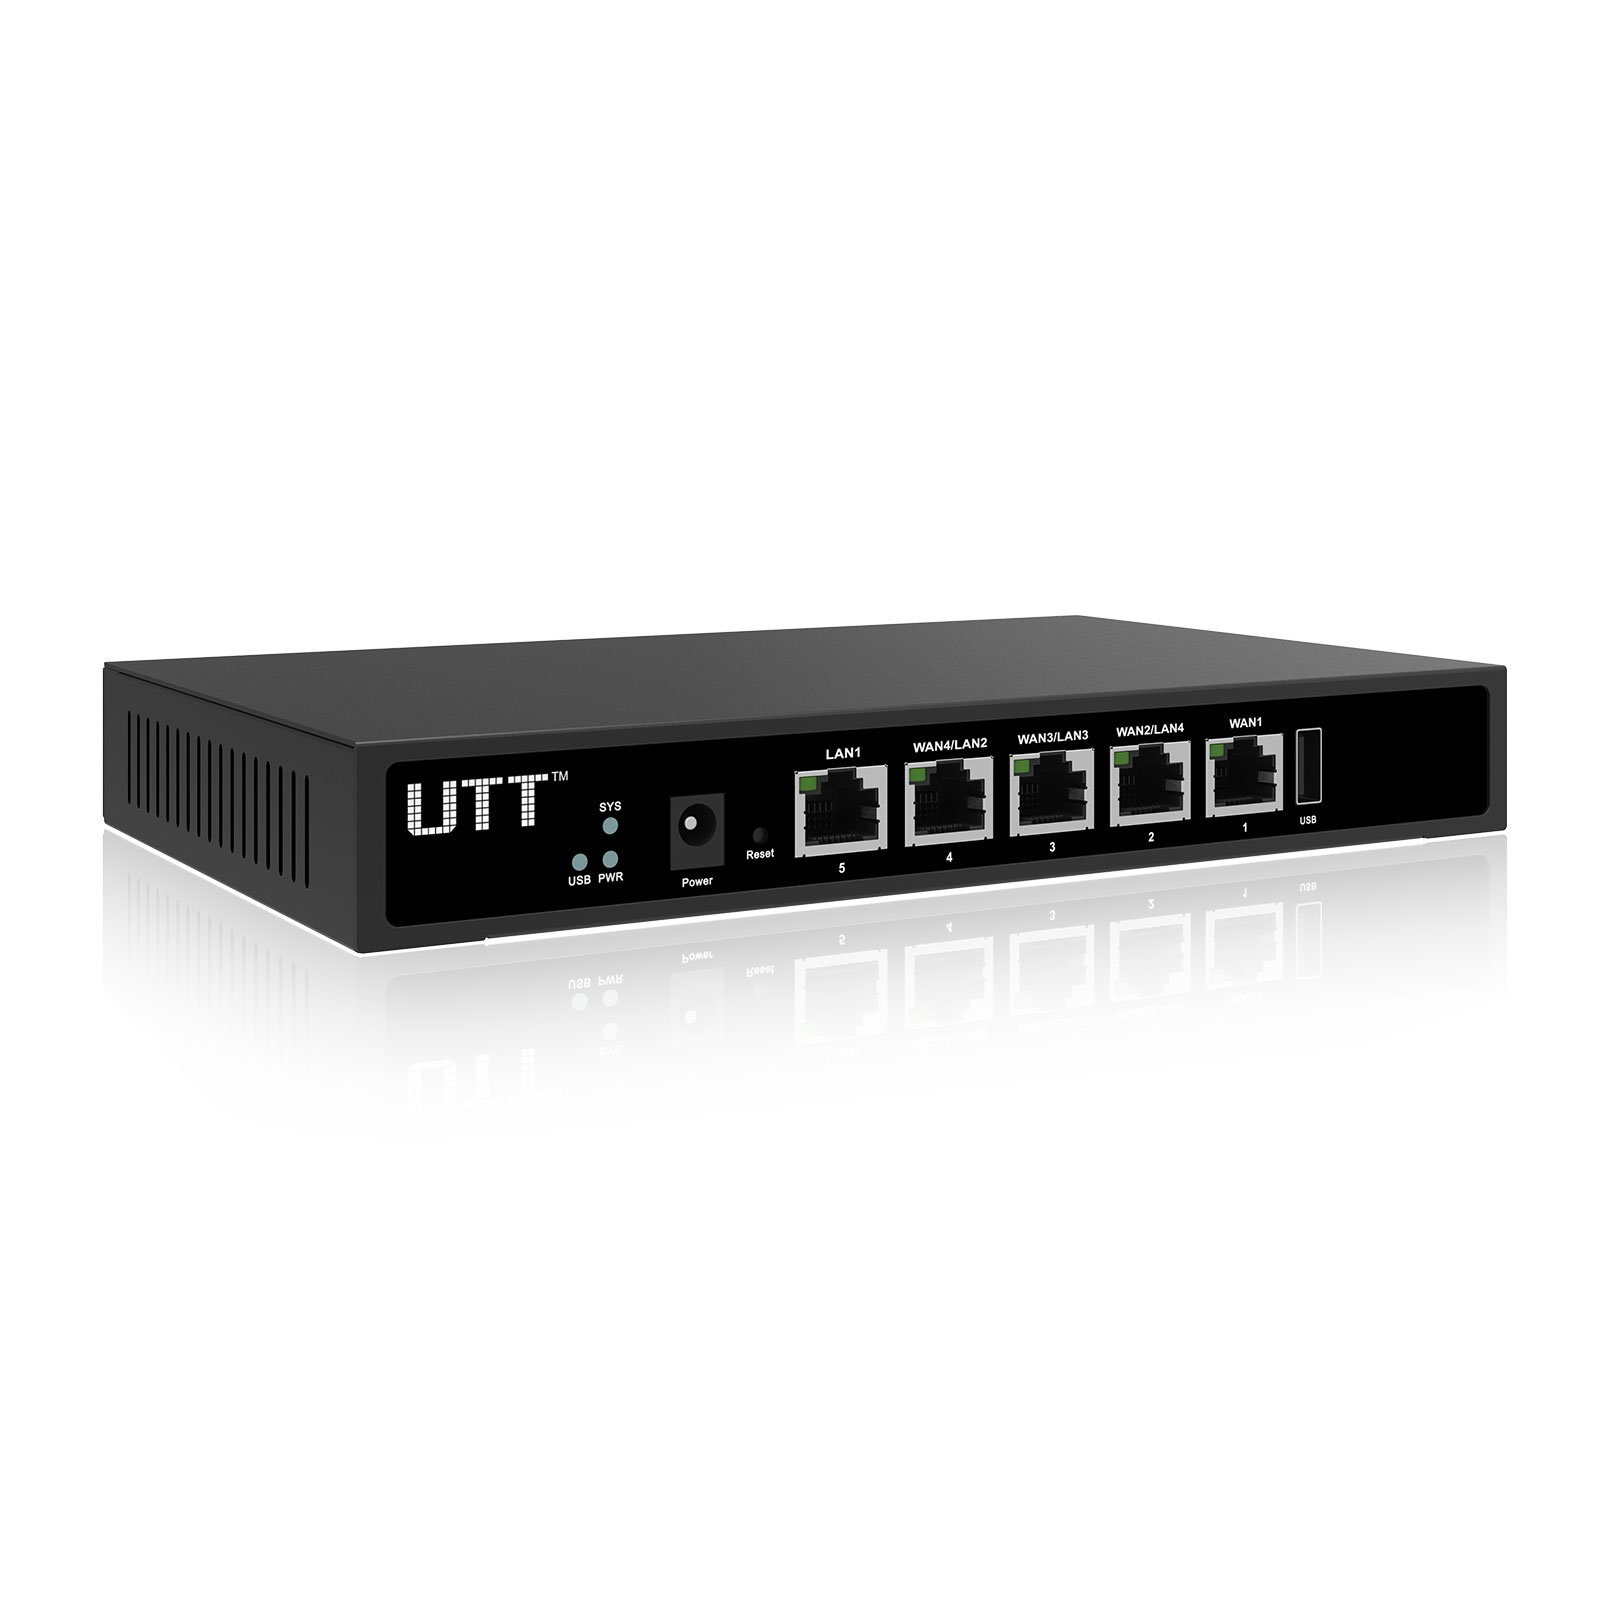 UTT ER840G 4 Port Internet WAN Router with 4 Gigabit WAN Ports – Load Balance & Failover – VPN – USB – access control – for business